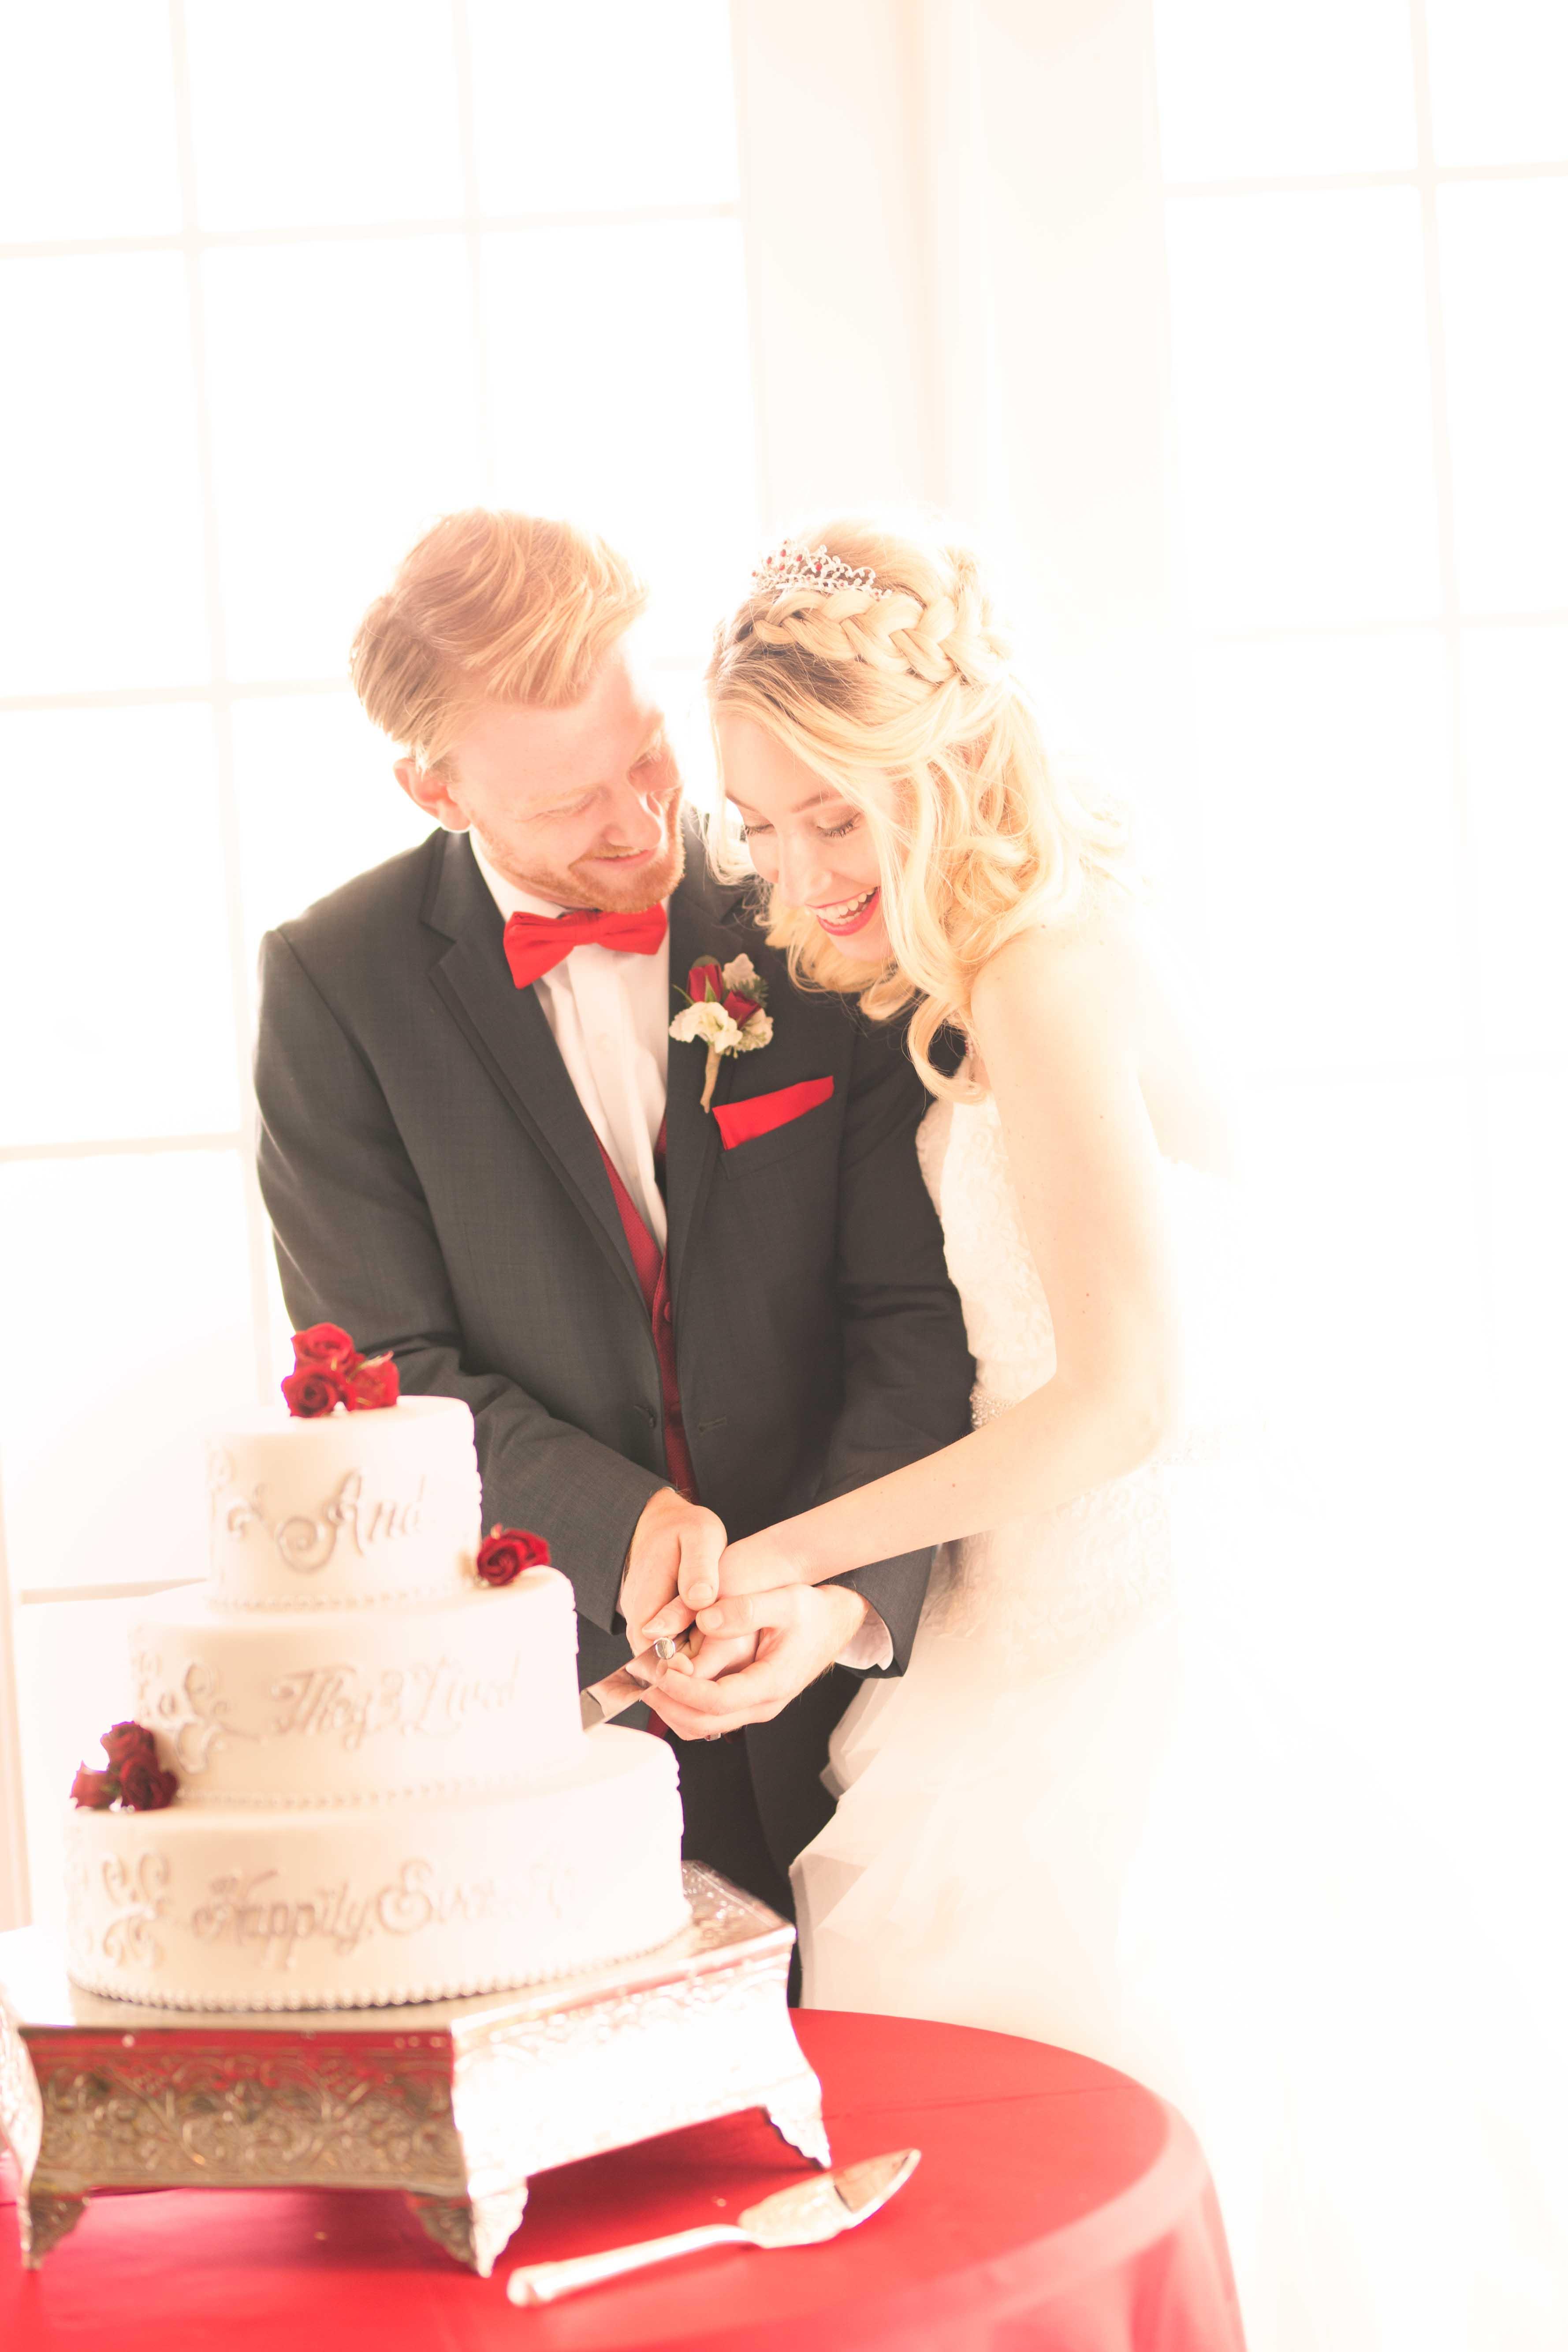 red winter wedding couple cut cake